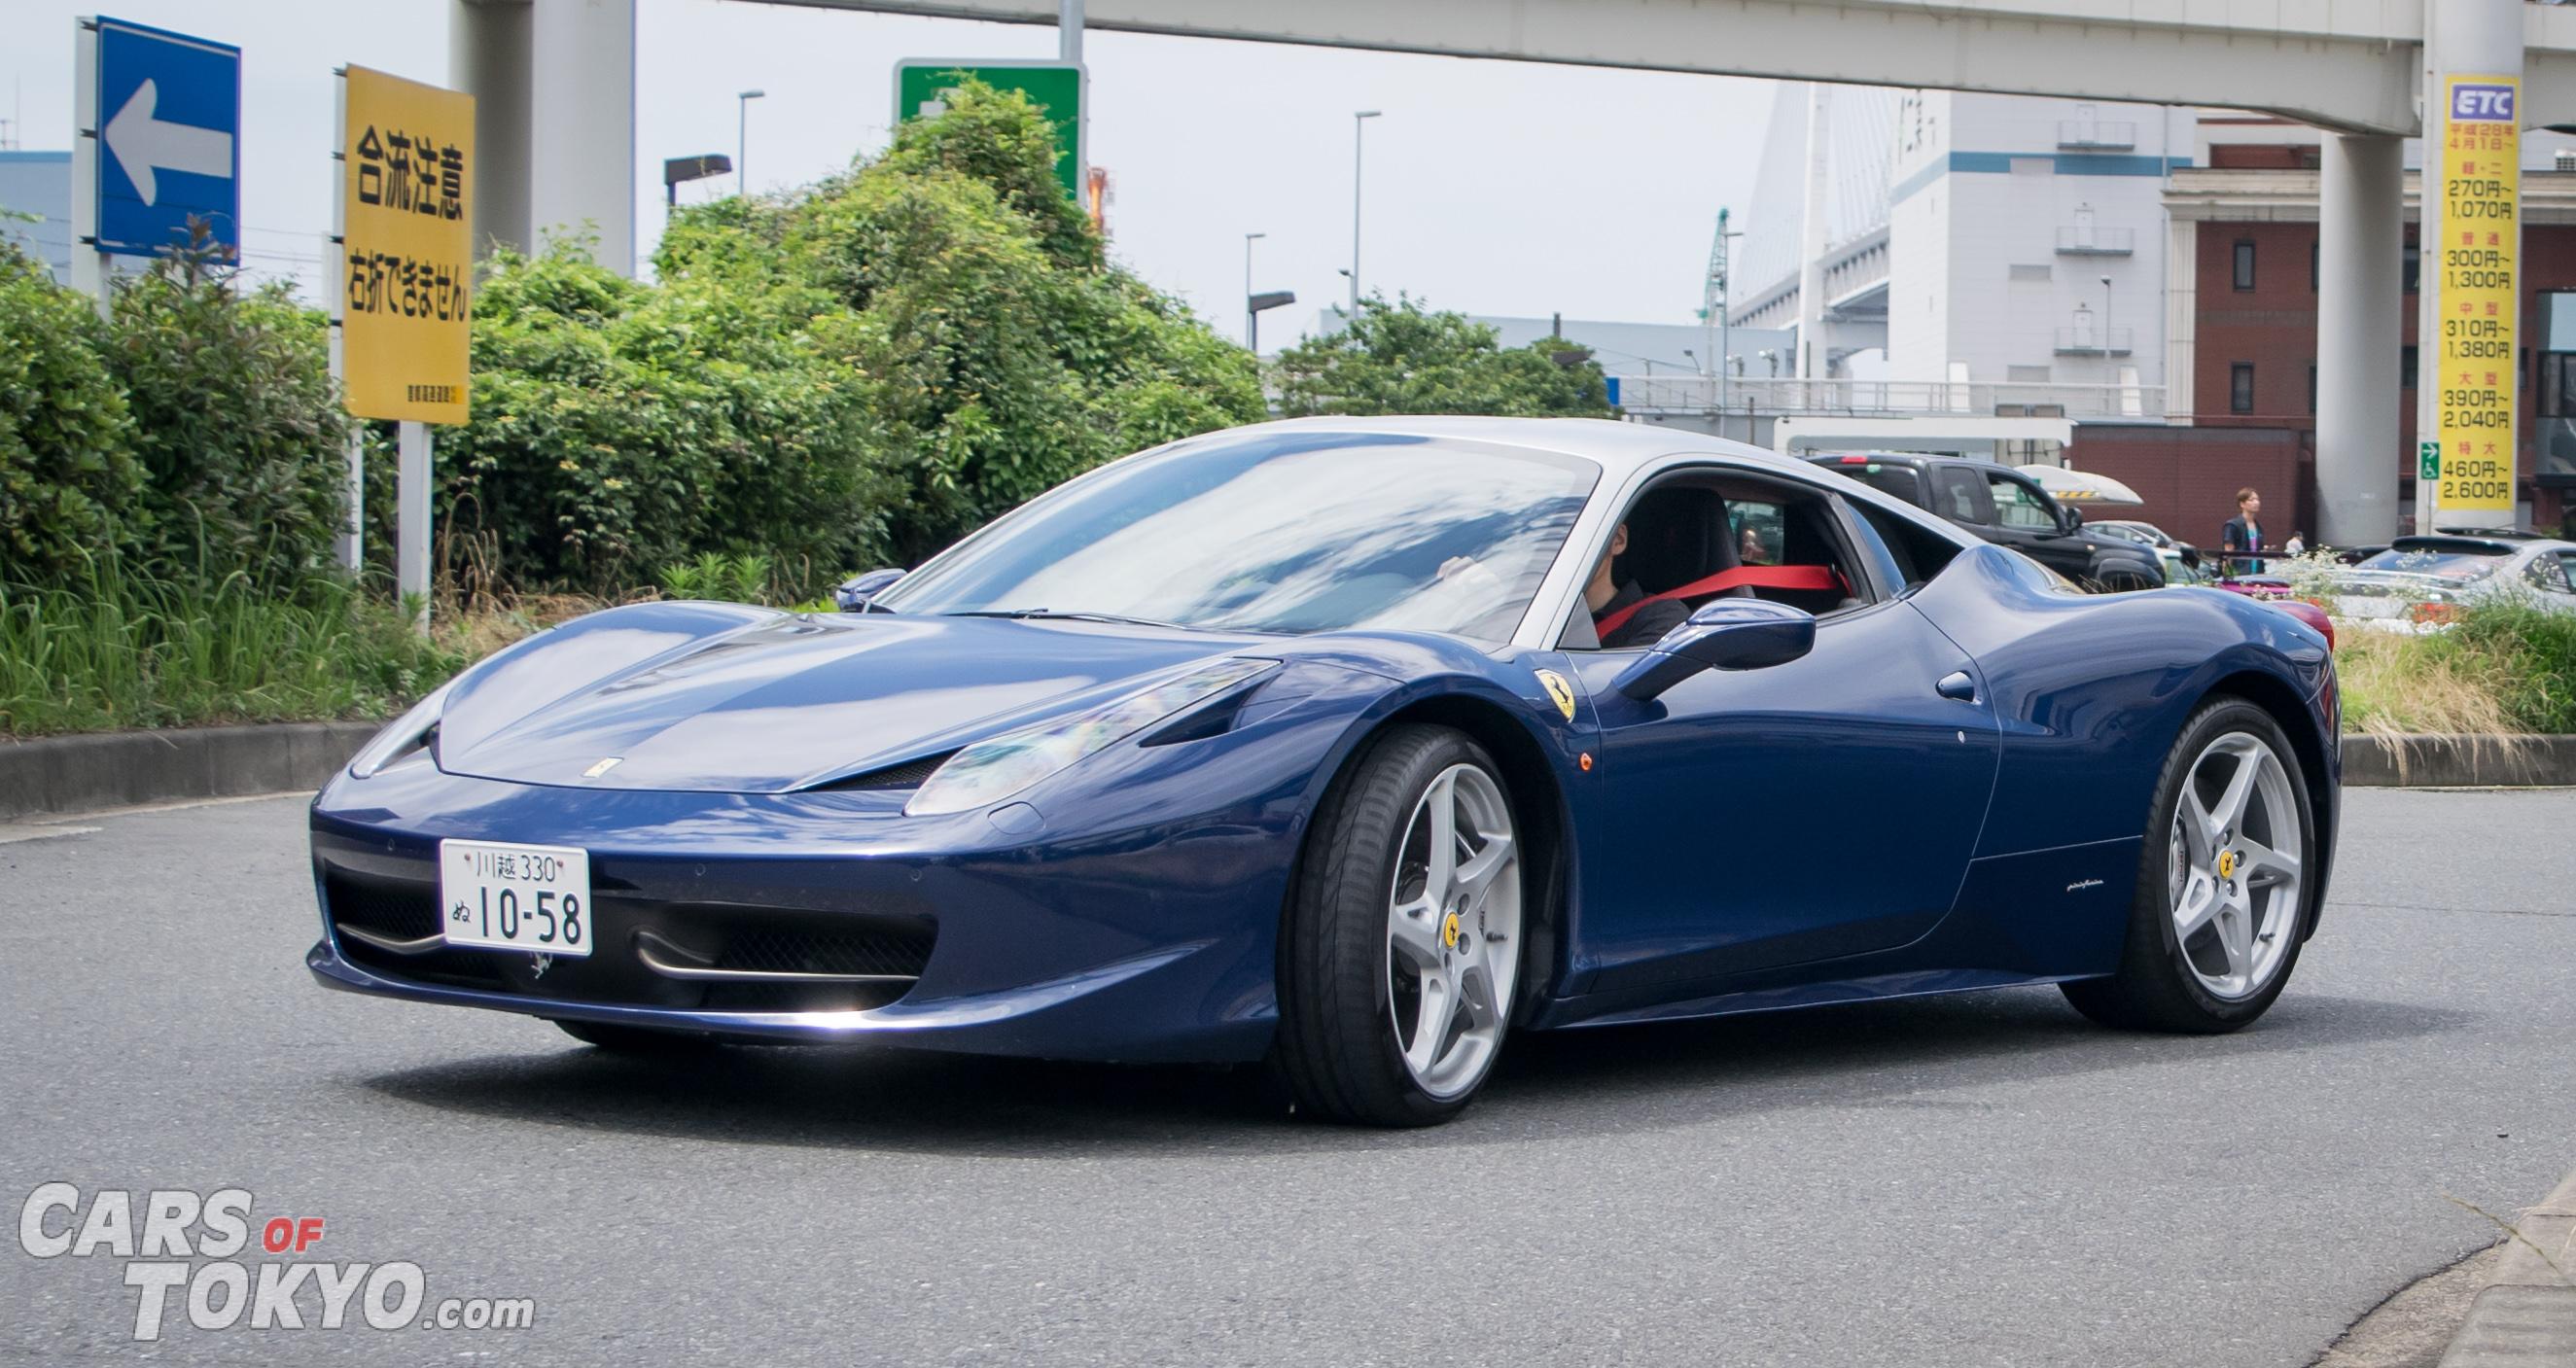 Cars of Tokyo Clean Ferrari 458 Italia